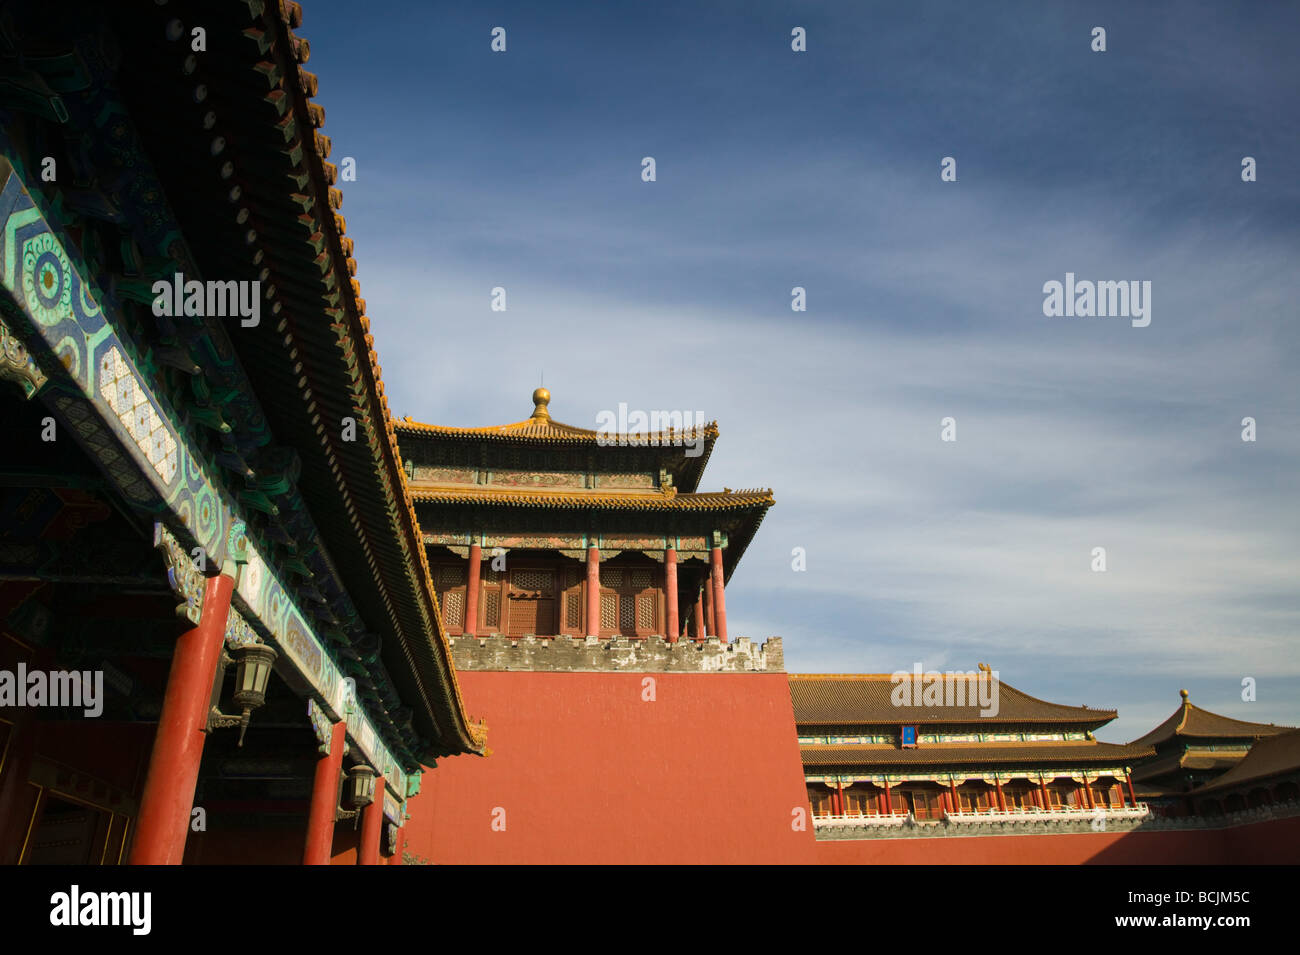 Cina, Pechino, Città Proibita, Meridian Gate Foto Stock